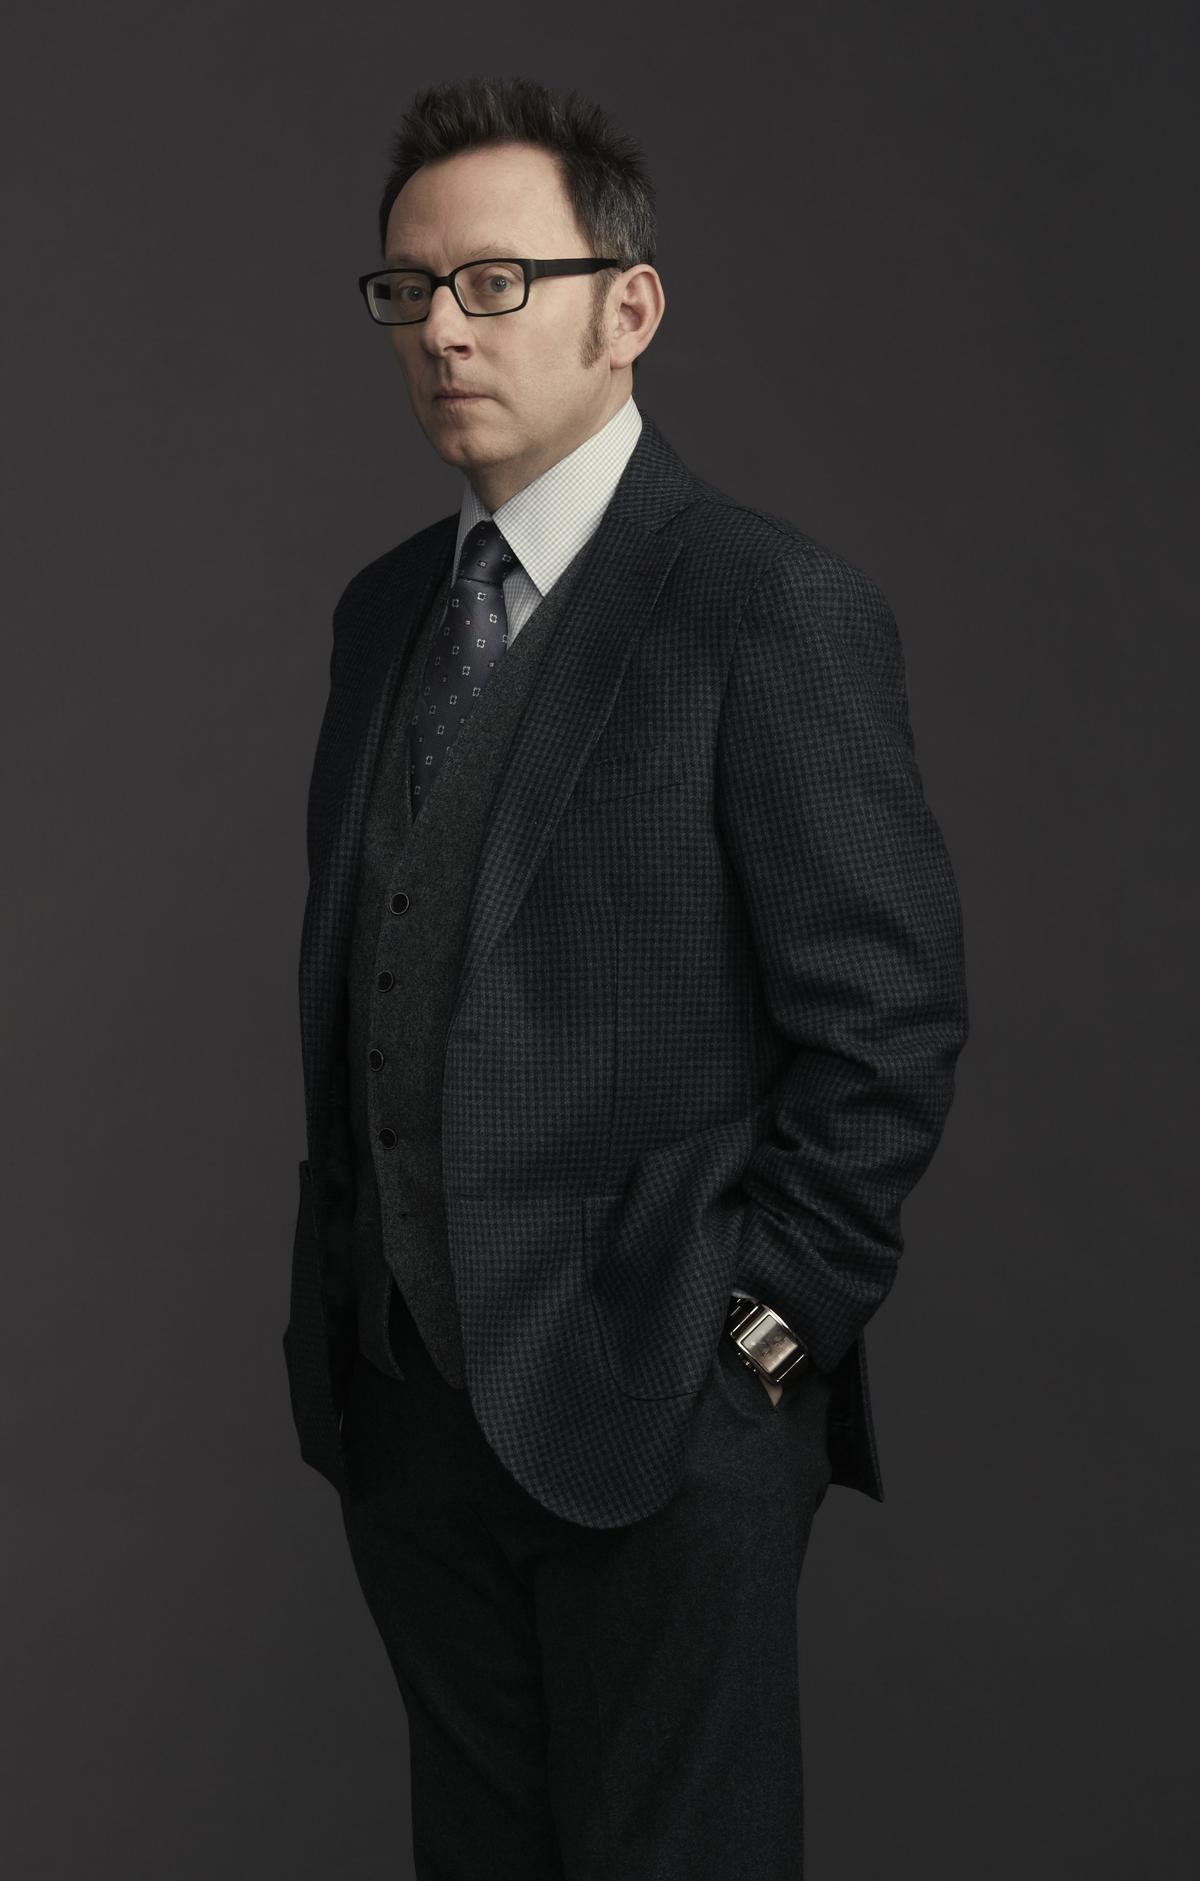 Person of Interest Alum Joins Arrow in Season 6